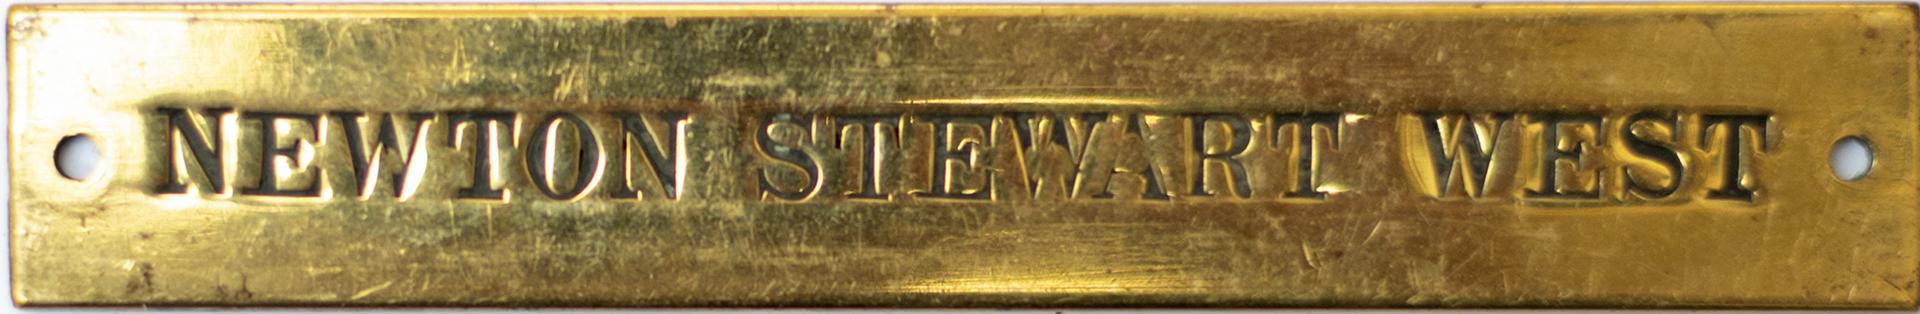 Portpatrick and Wigtownshire Joint Railway brass signal box shelfplate NEWTON STEWART WEST. Hand